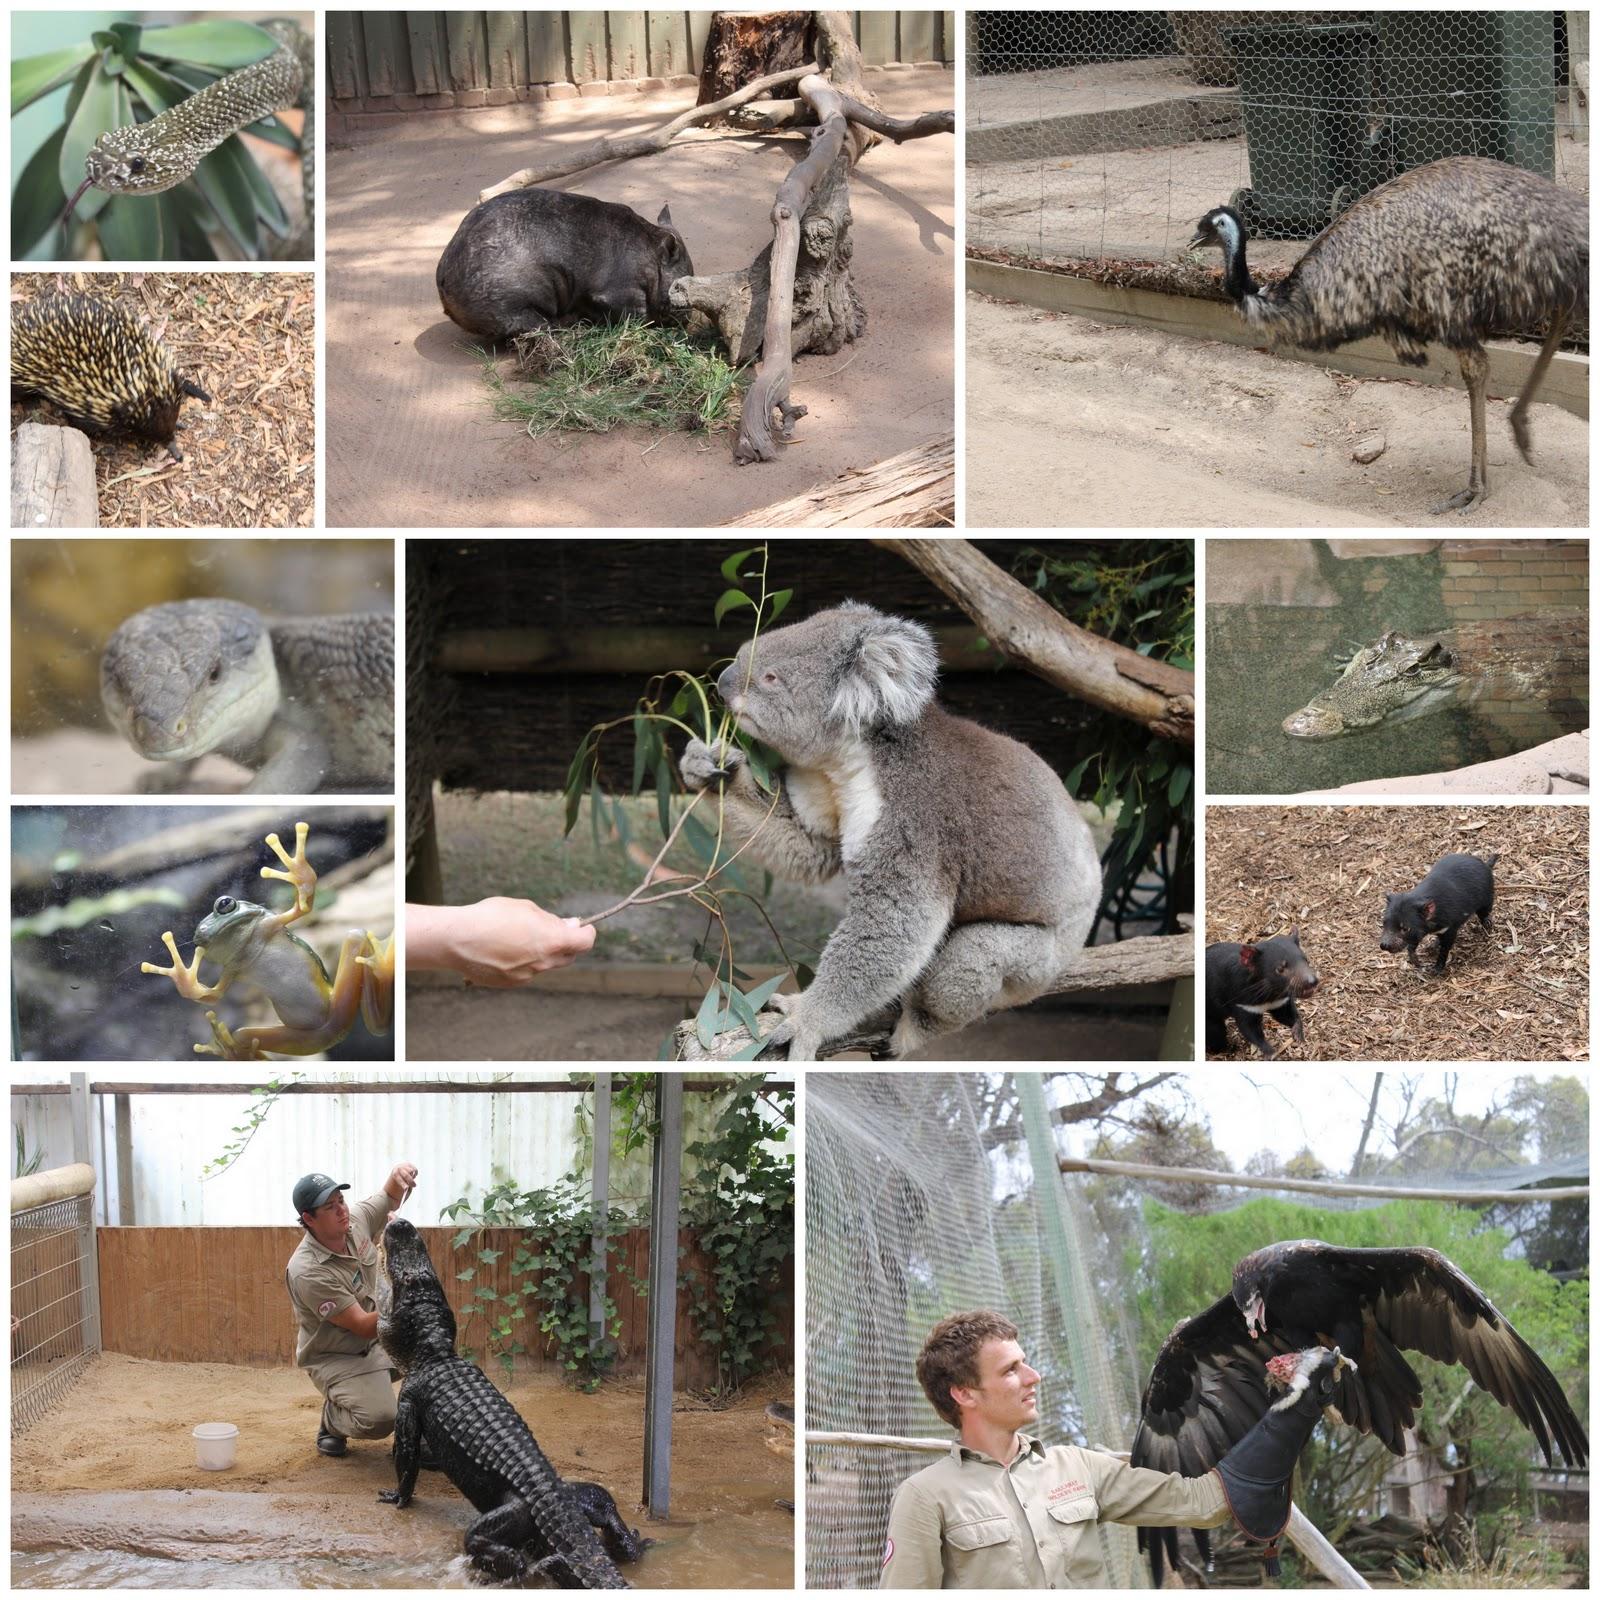 images ballarat wildlife - photo #6